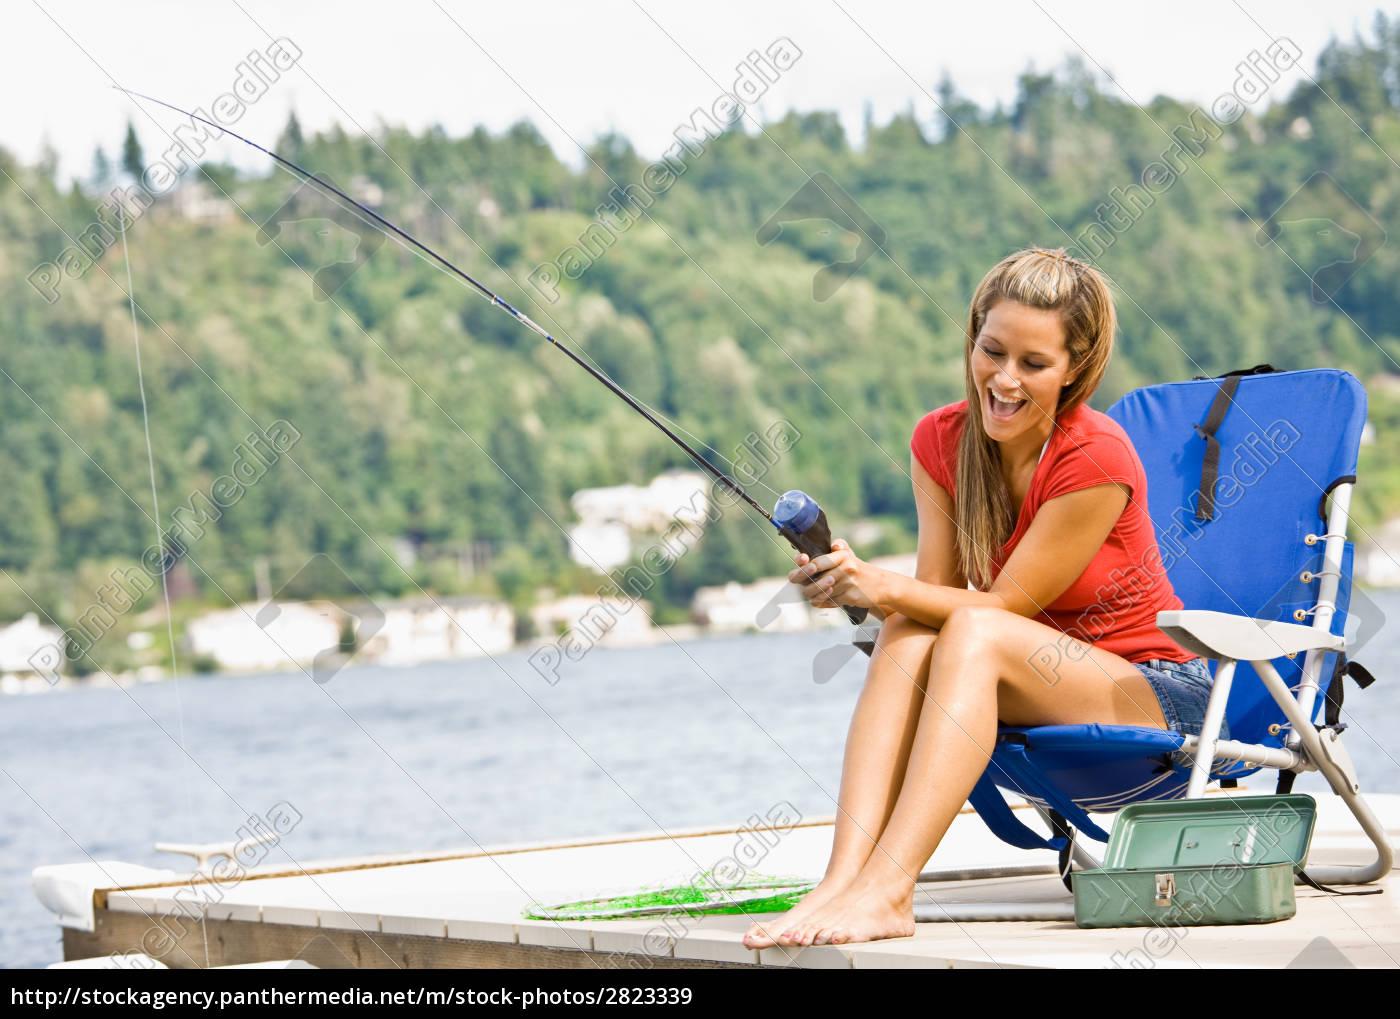 woman, fishing, on, pier - 2823339